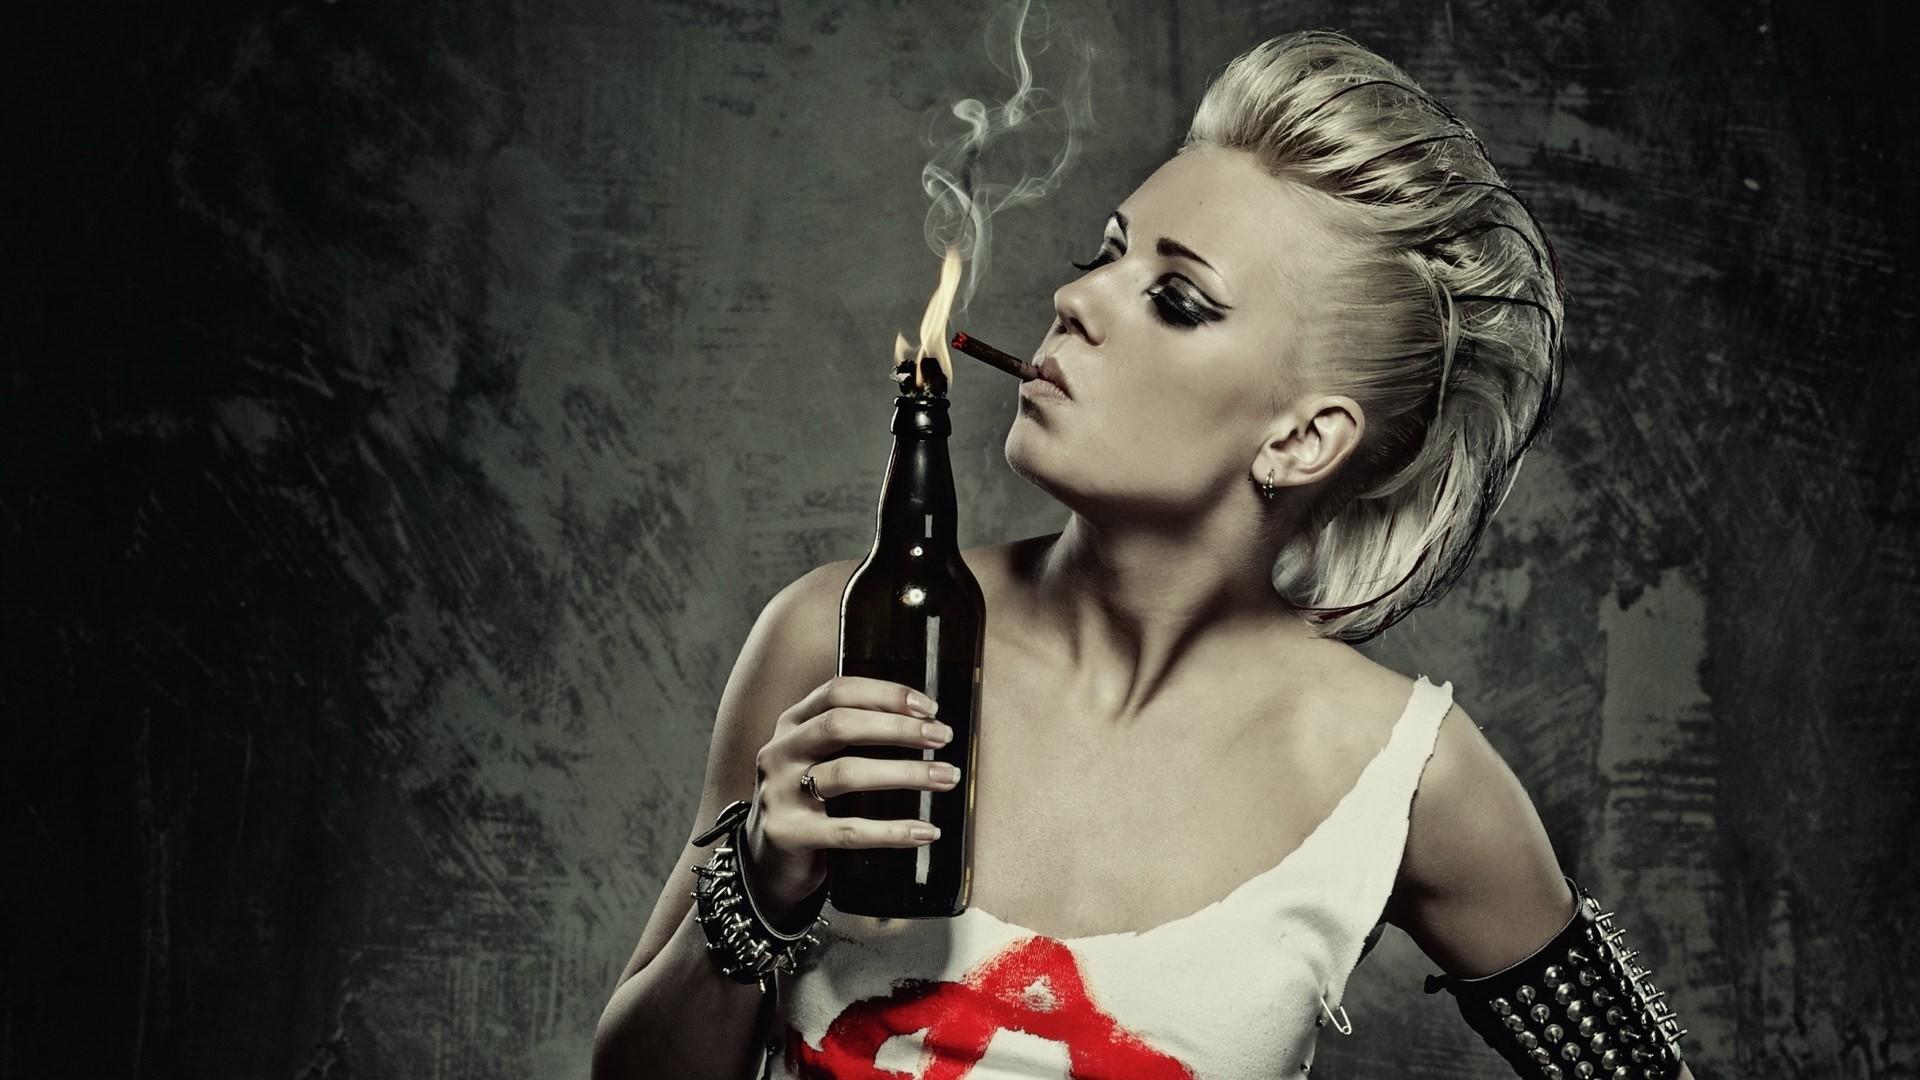 Smoking Girl Wallpaper – Sex Porn Images